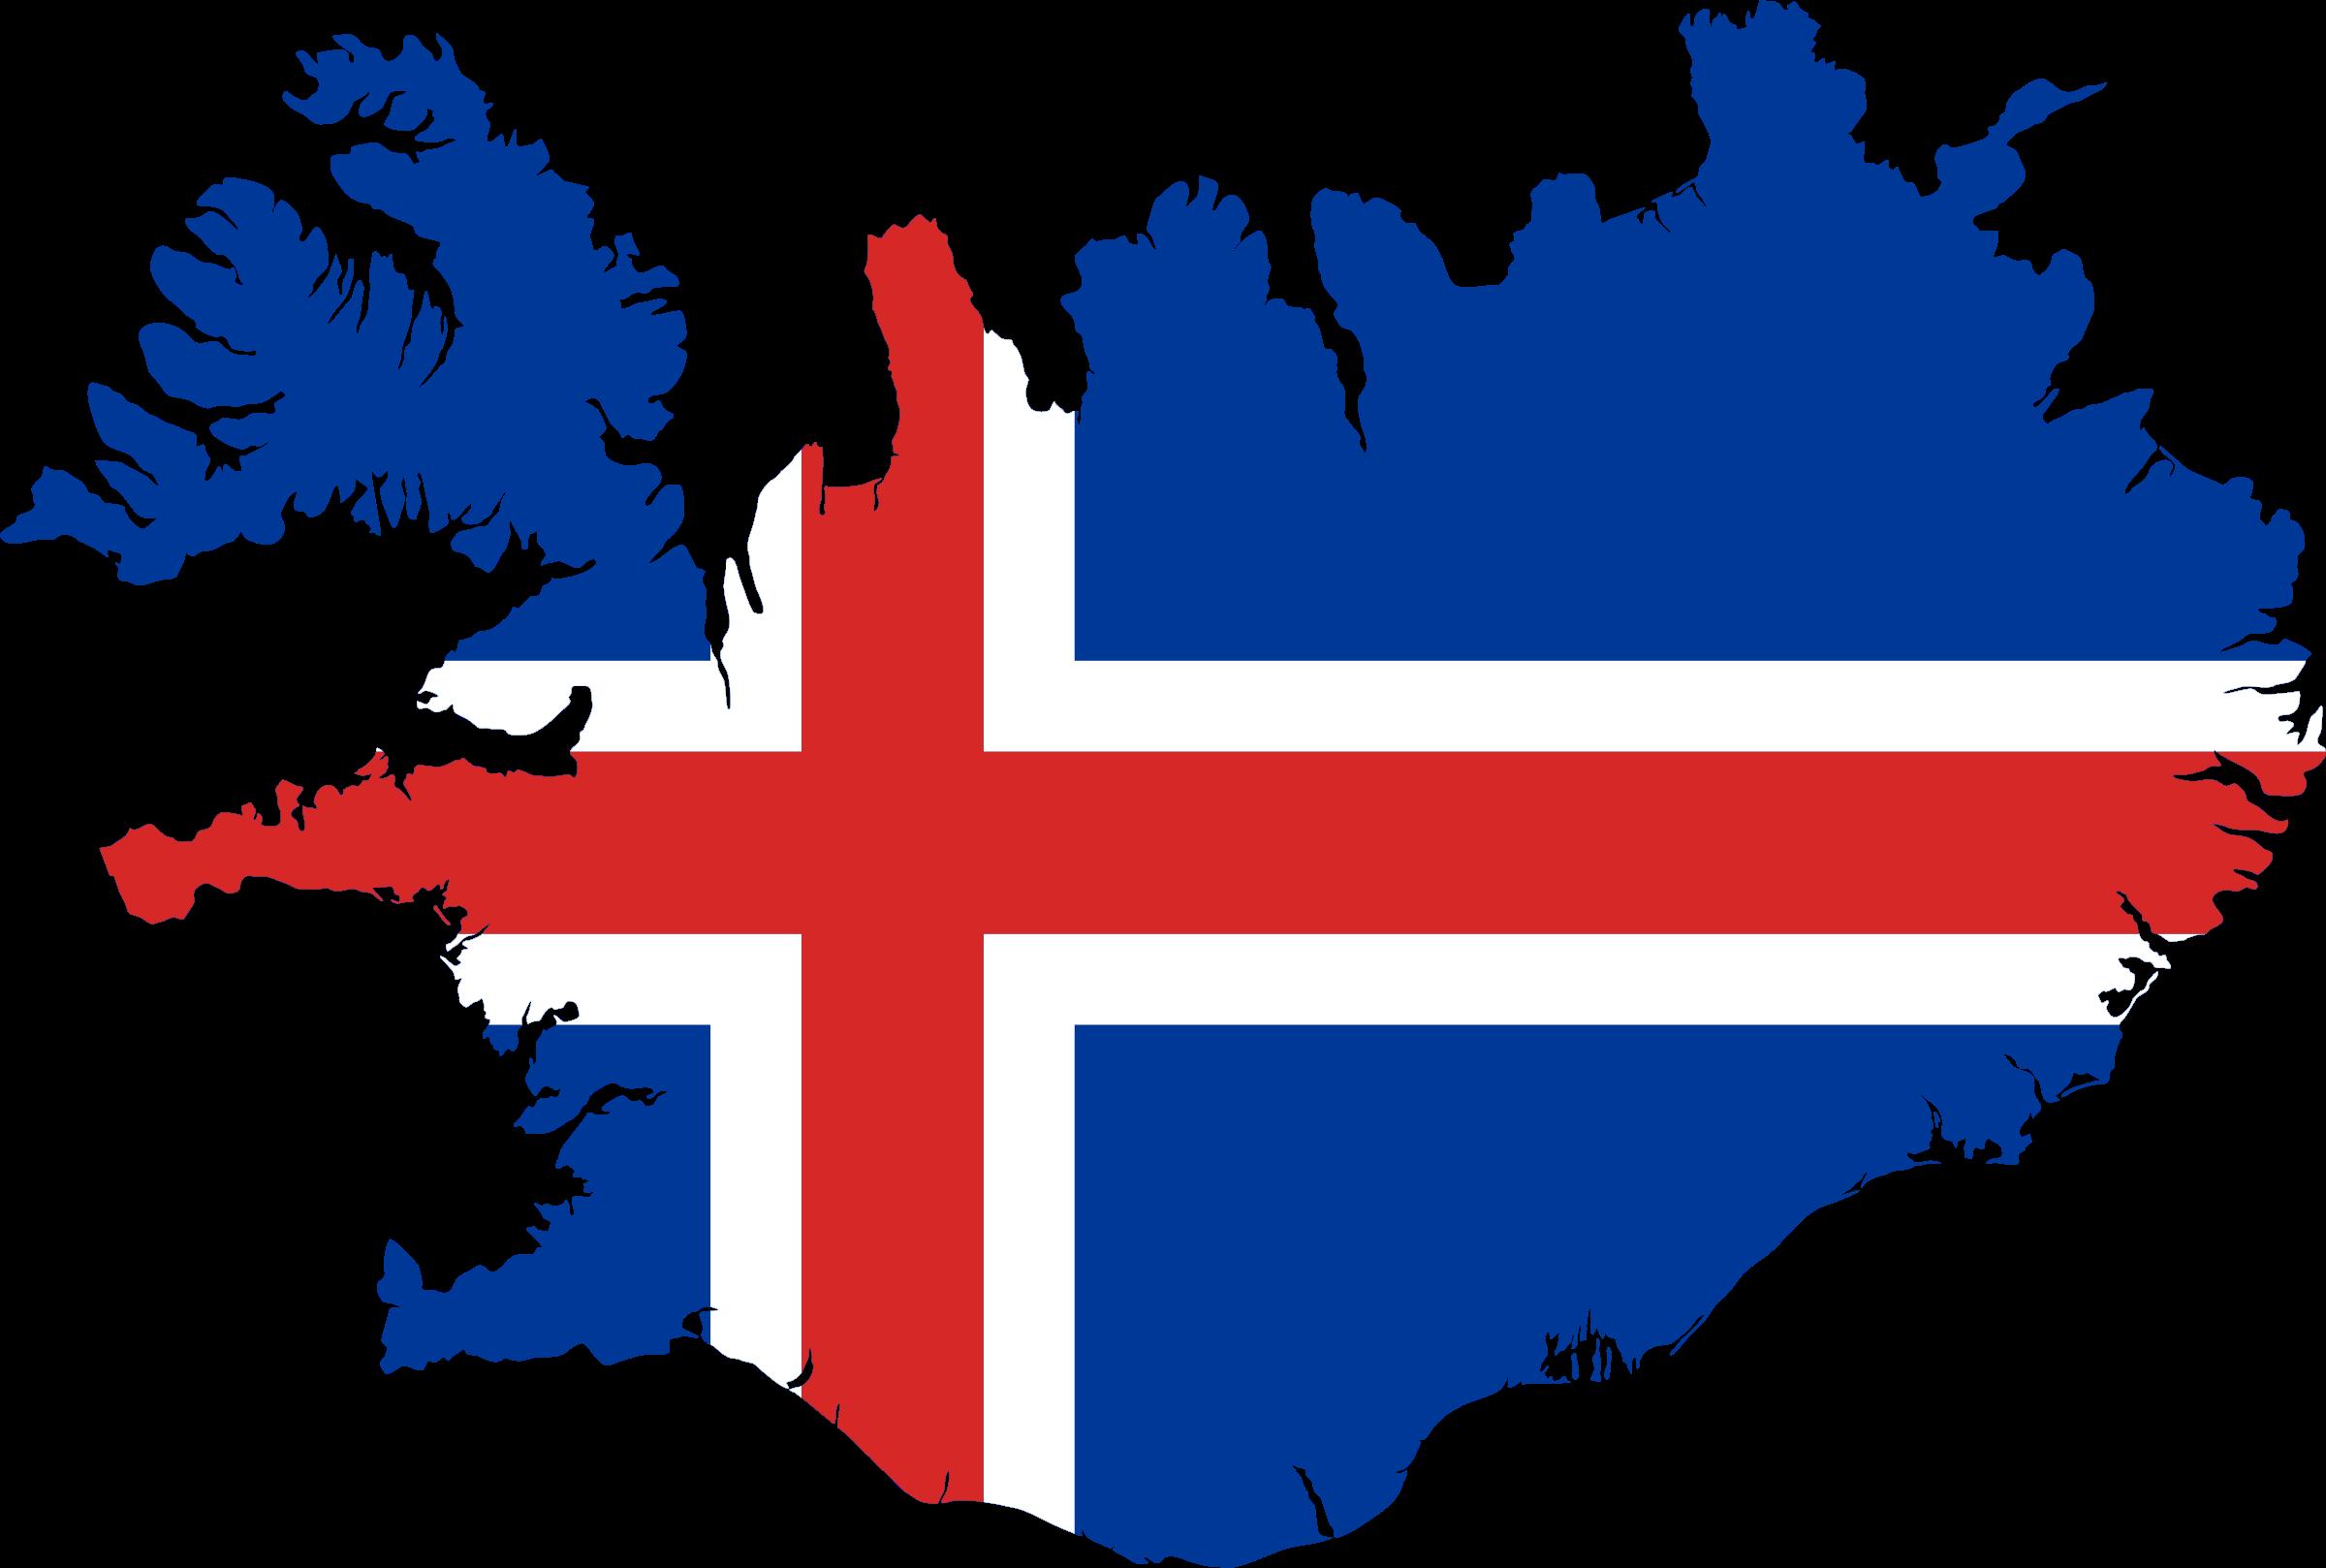 Iceland flag map. Earthquake clipart volcanic eruption